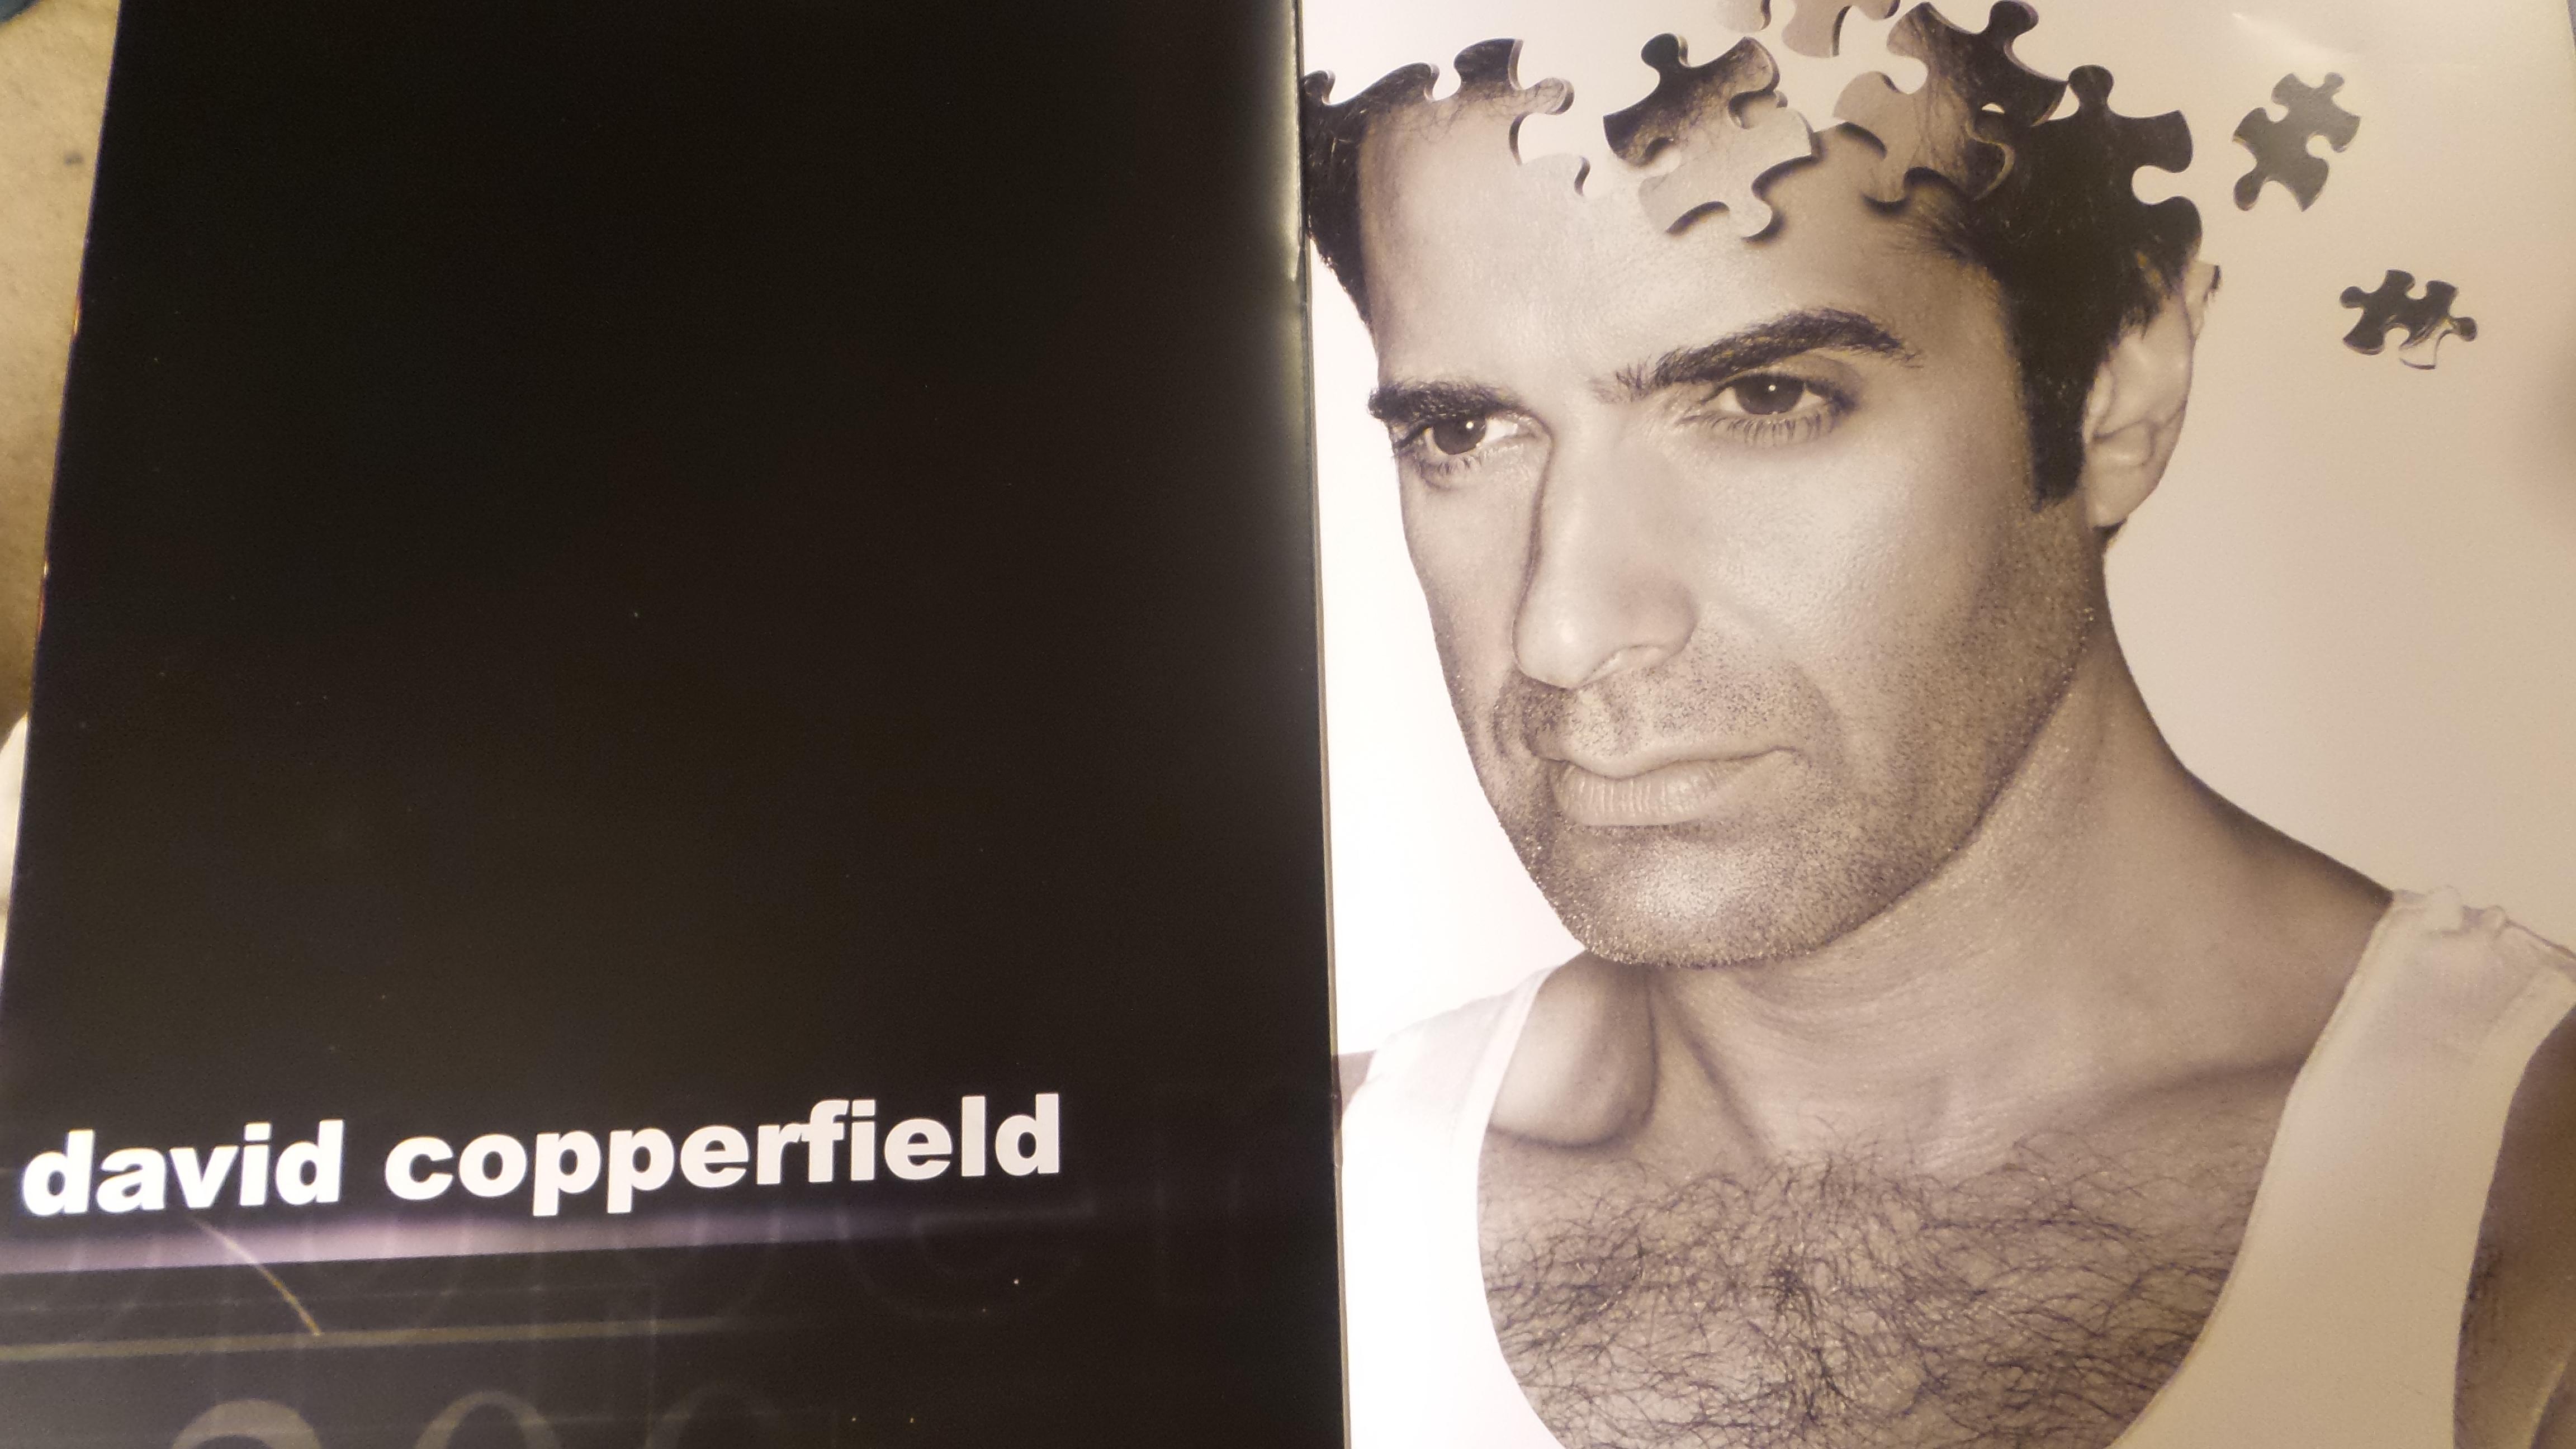 David copperfield nude — img 15